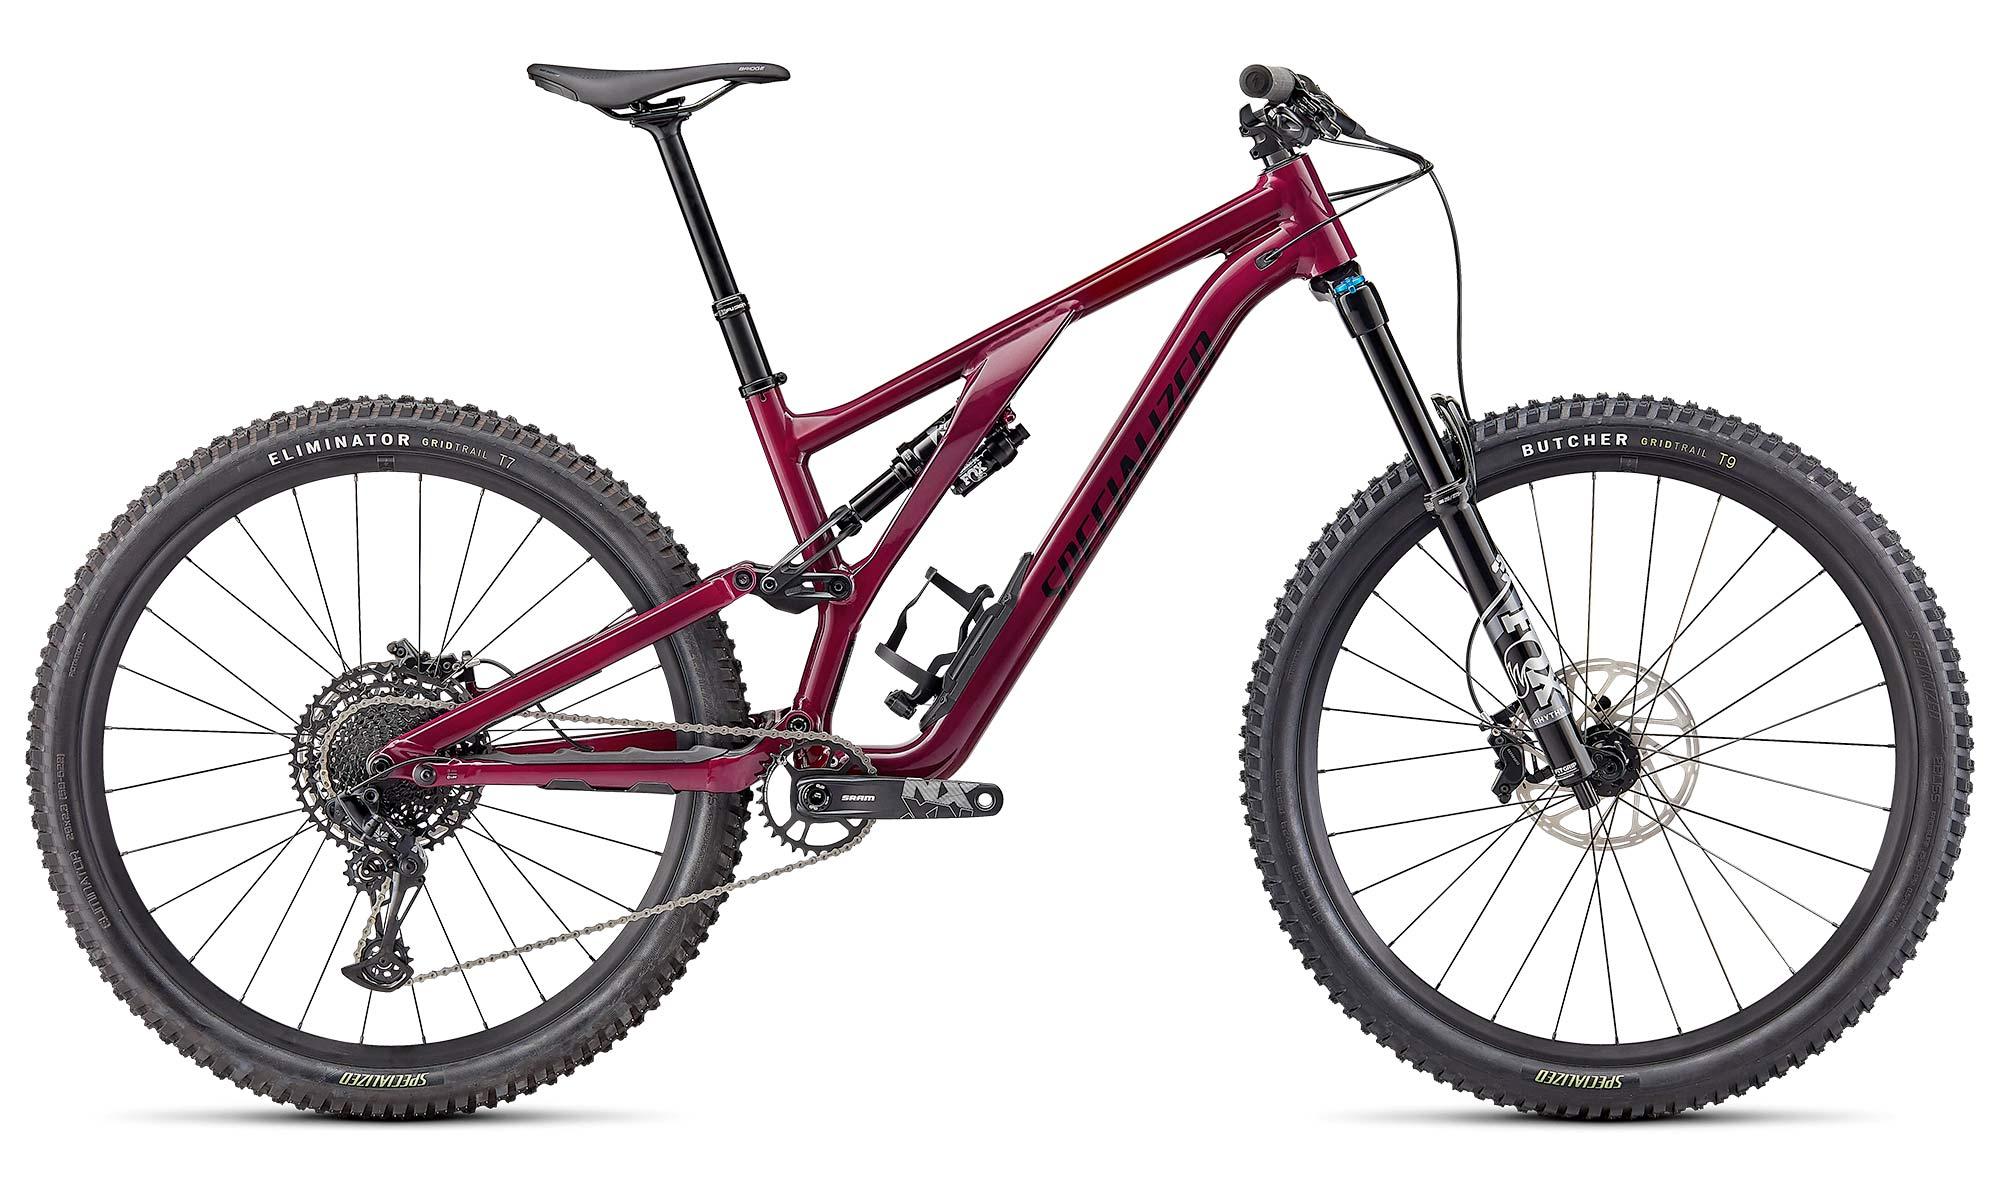 2022 Specialized Stumpjumper EVO Alloy trail bike, Comp complete